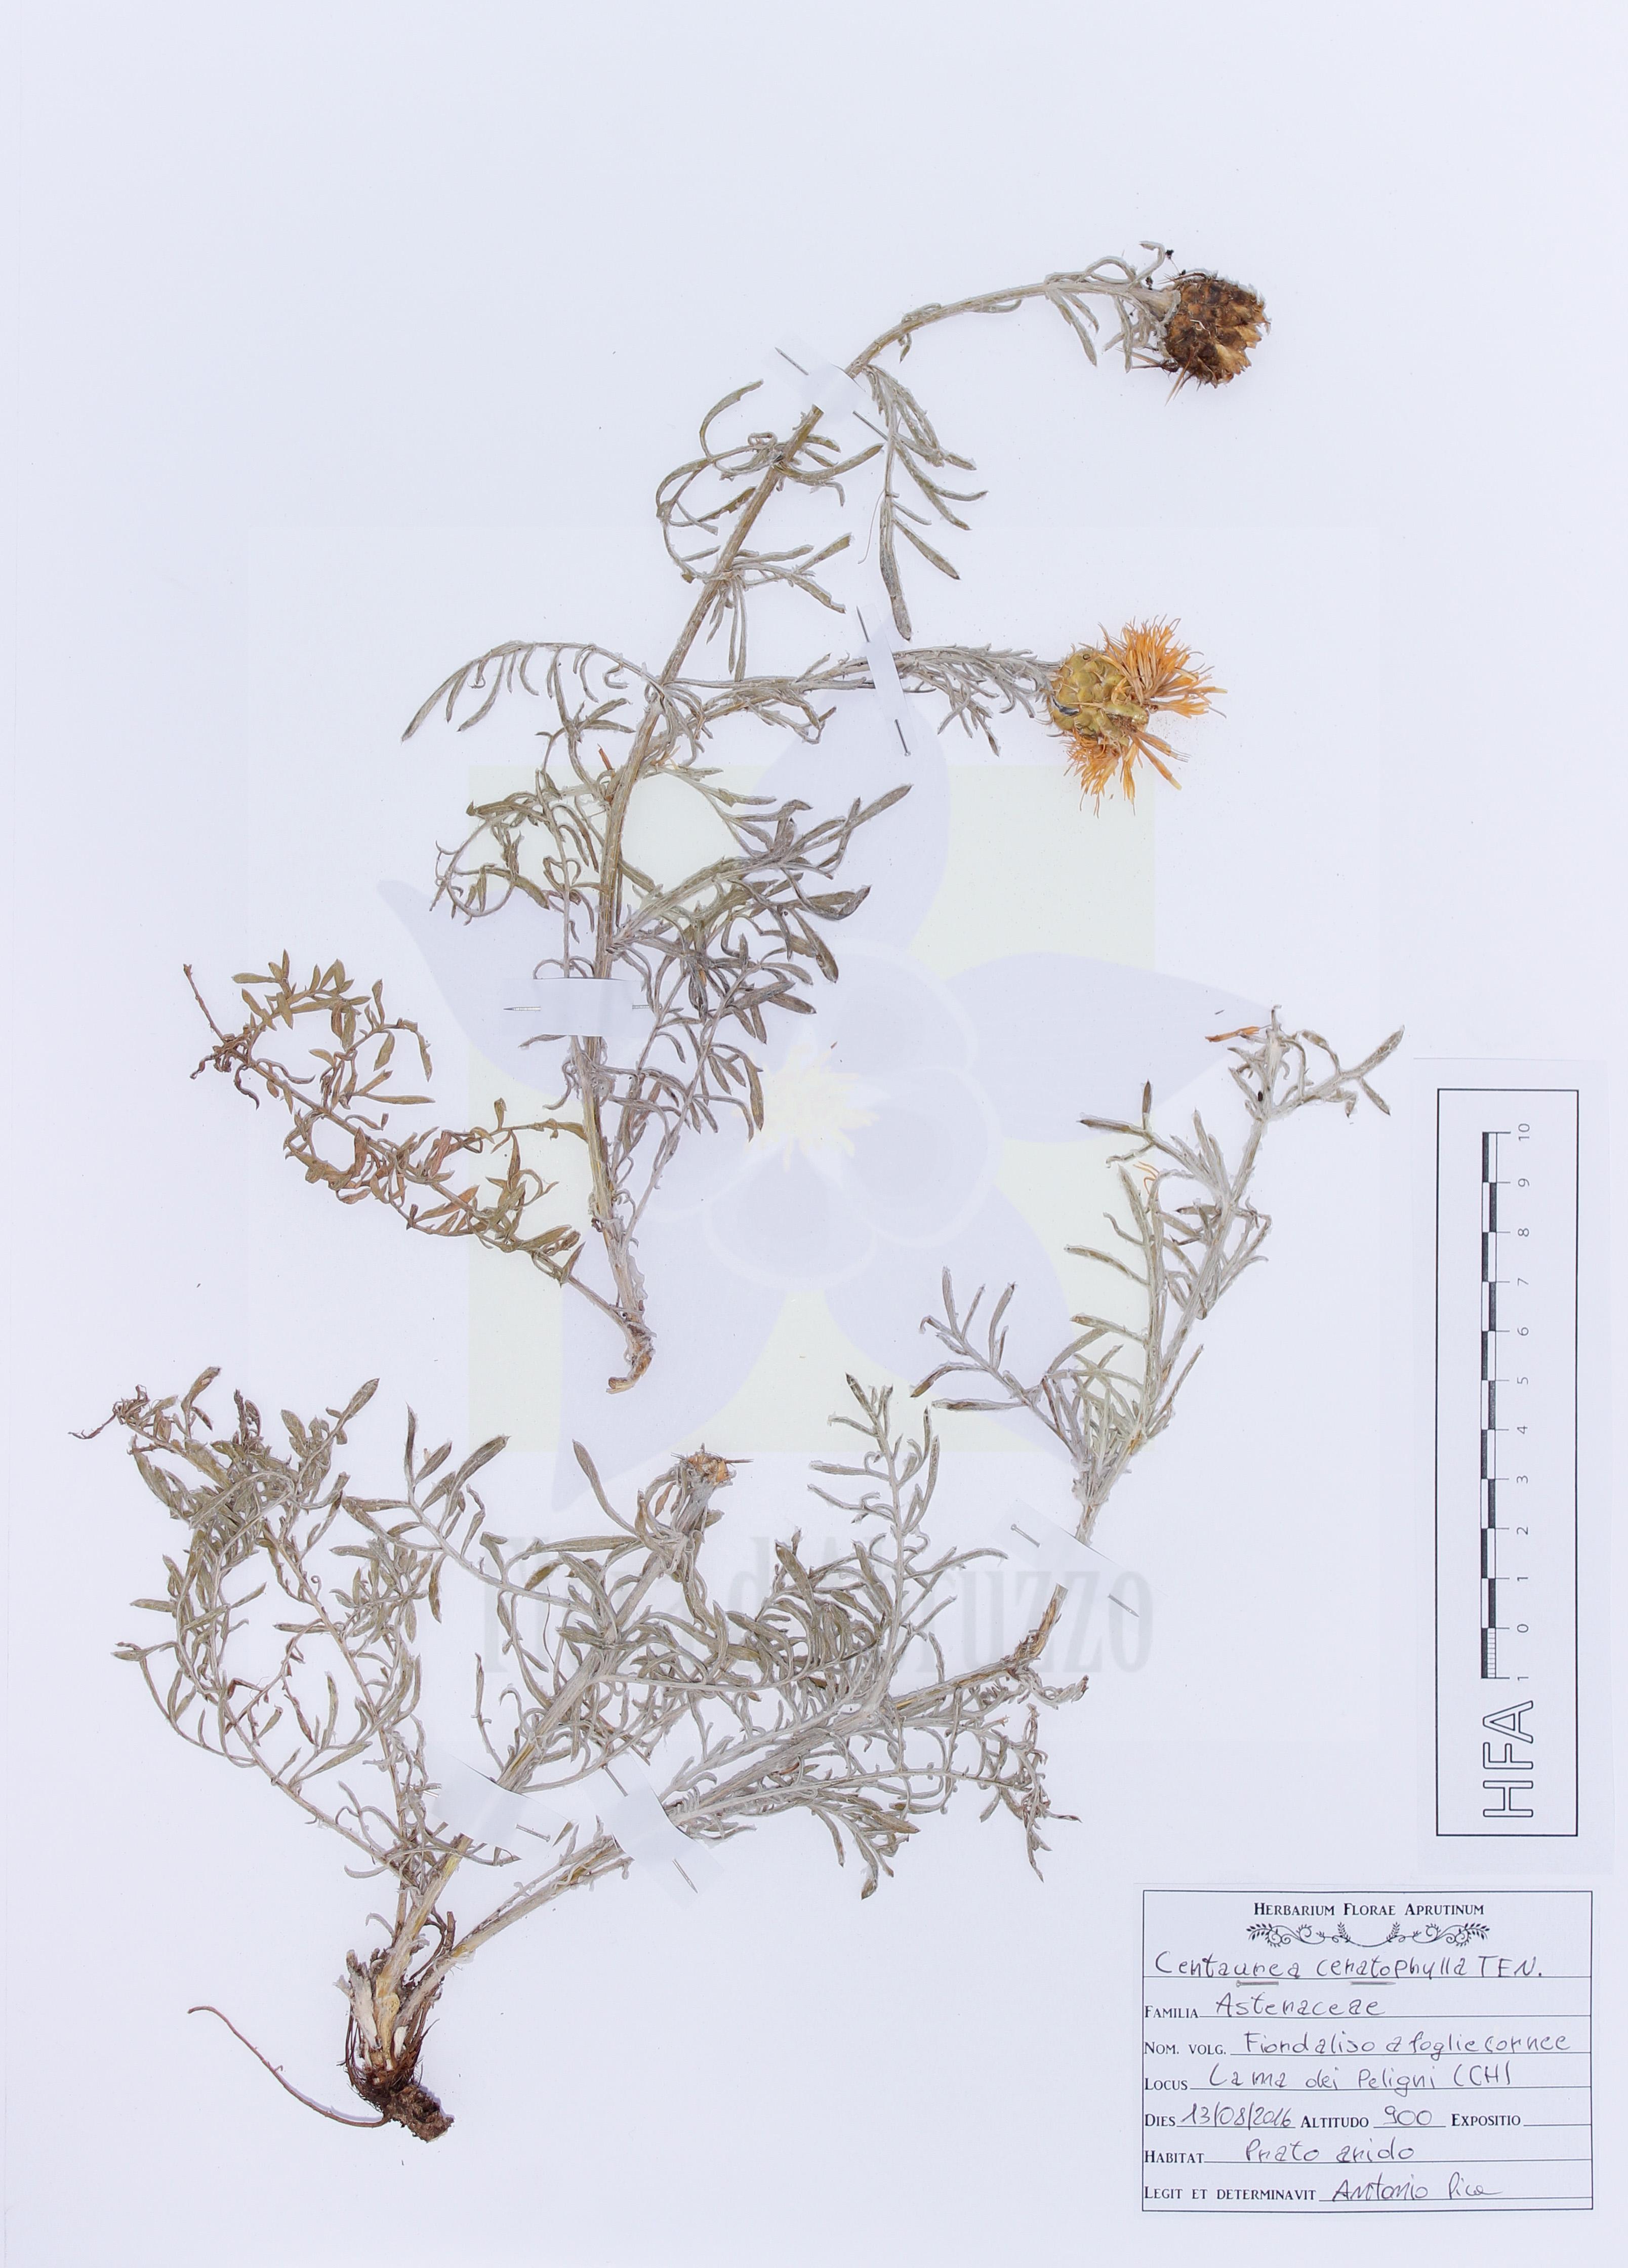 Centaurea ceratophyllaTen.